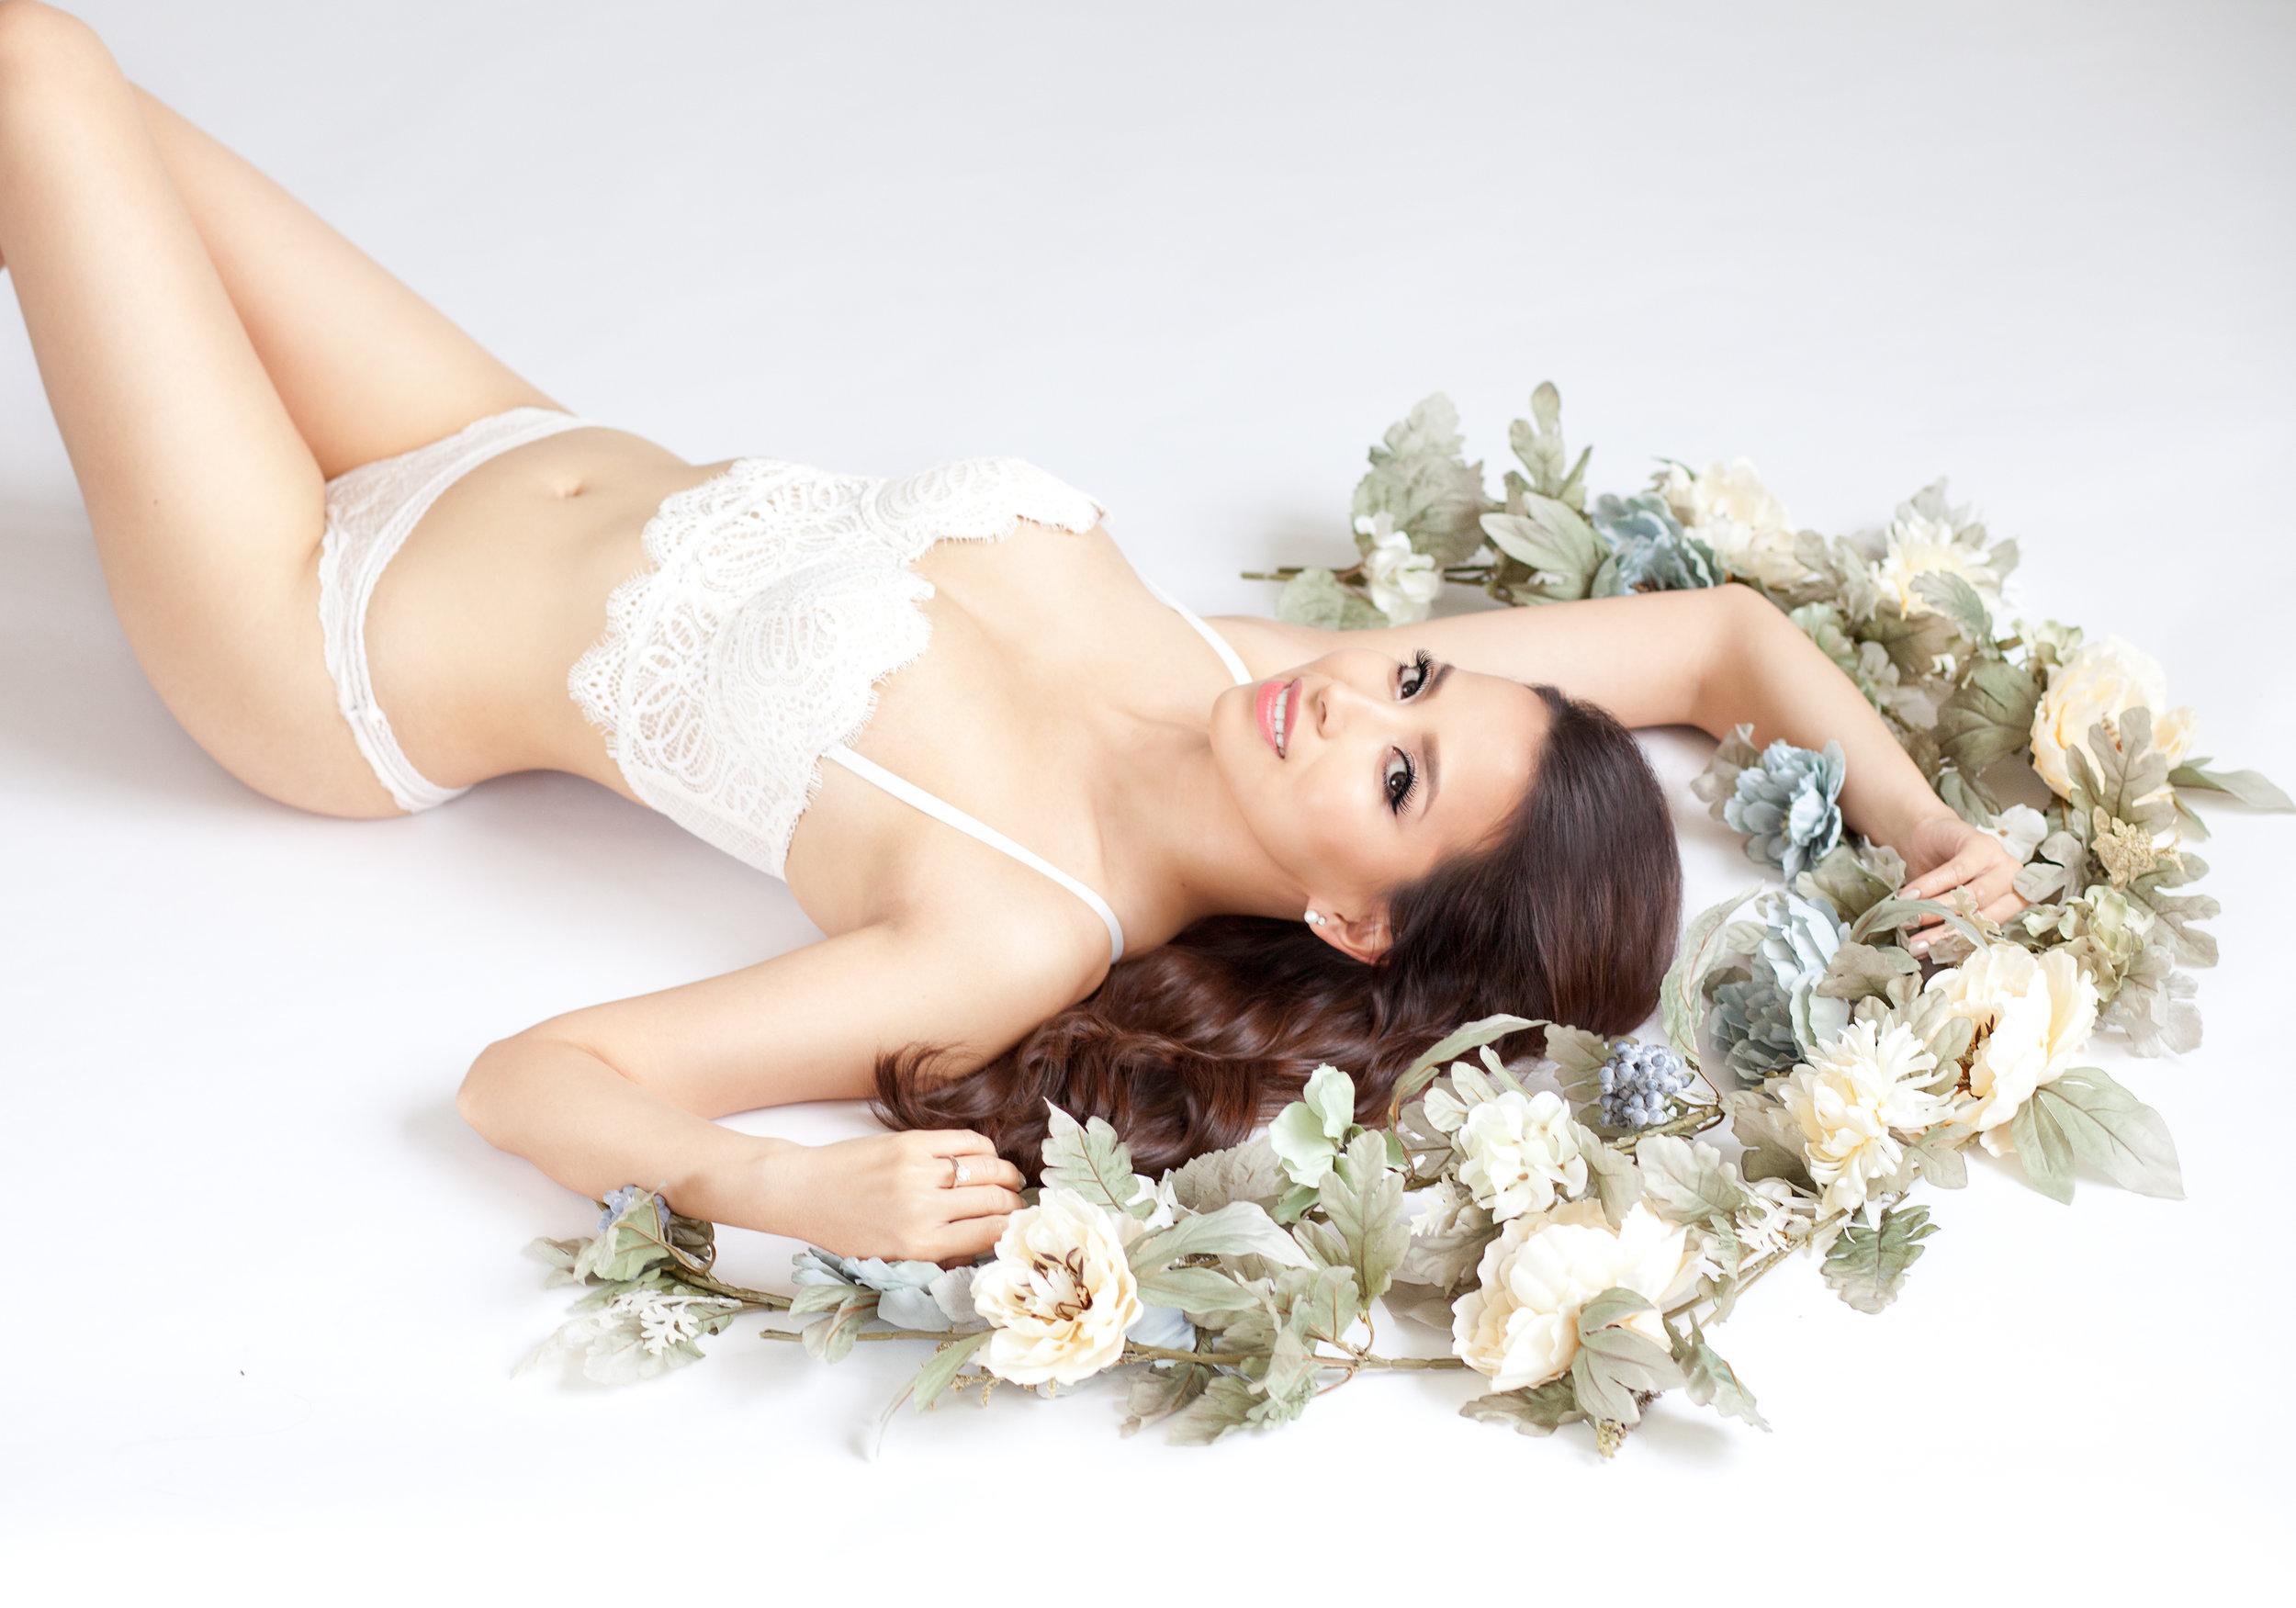 Stephanie-HighRes-CareyLynne-12.jpg